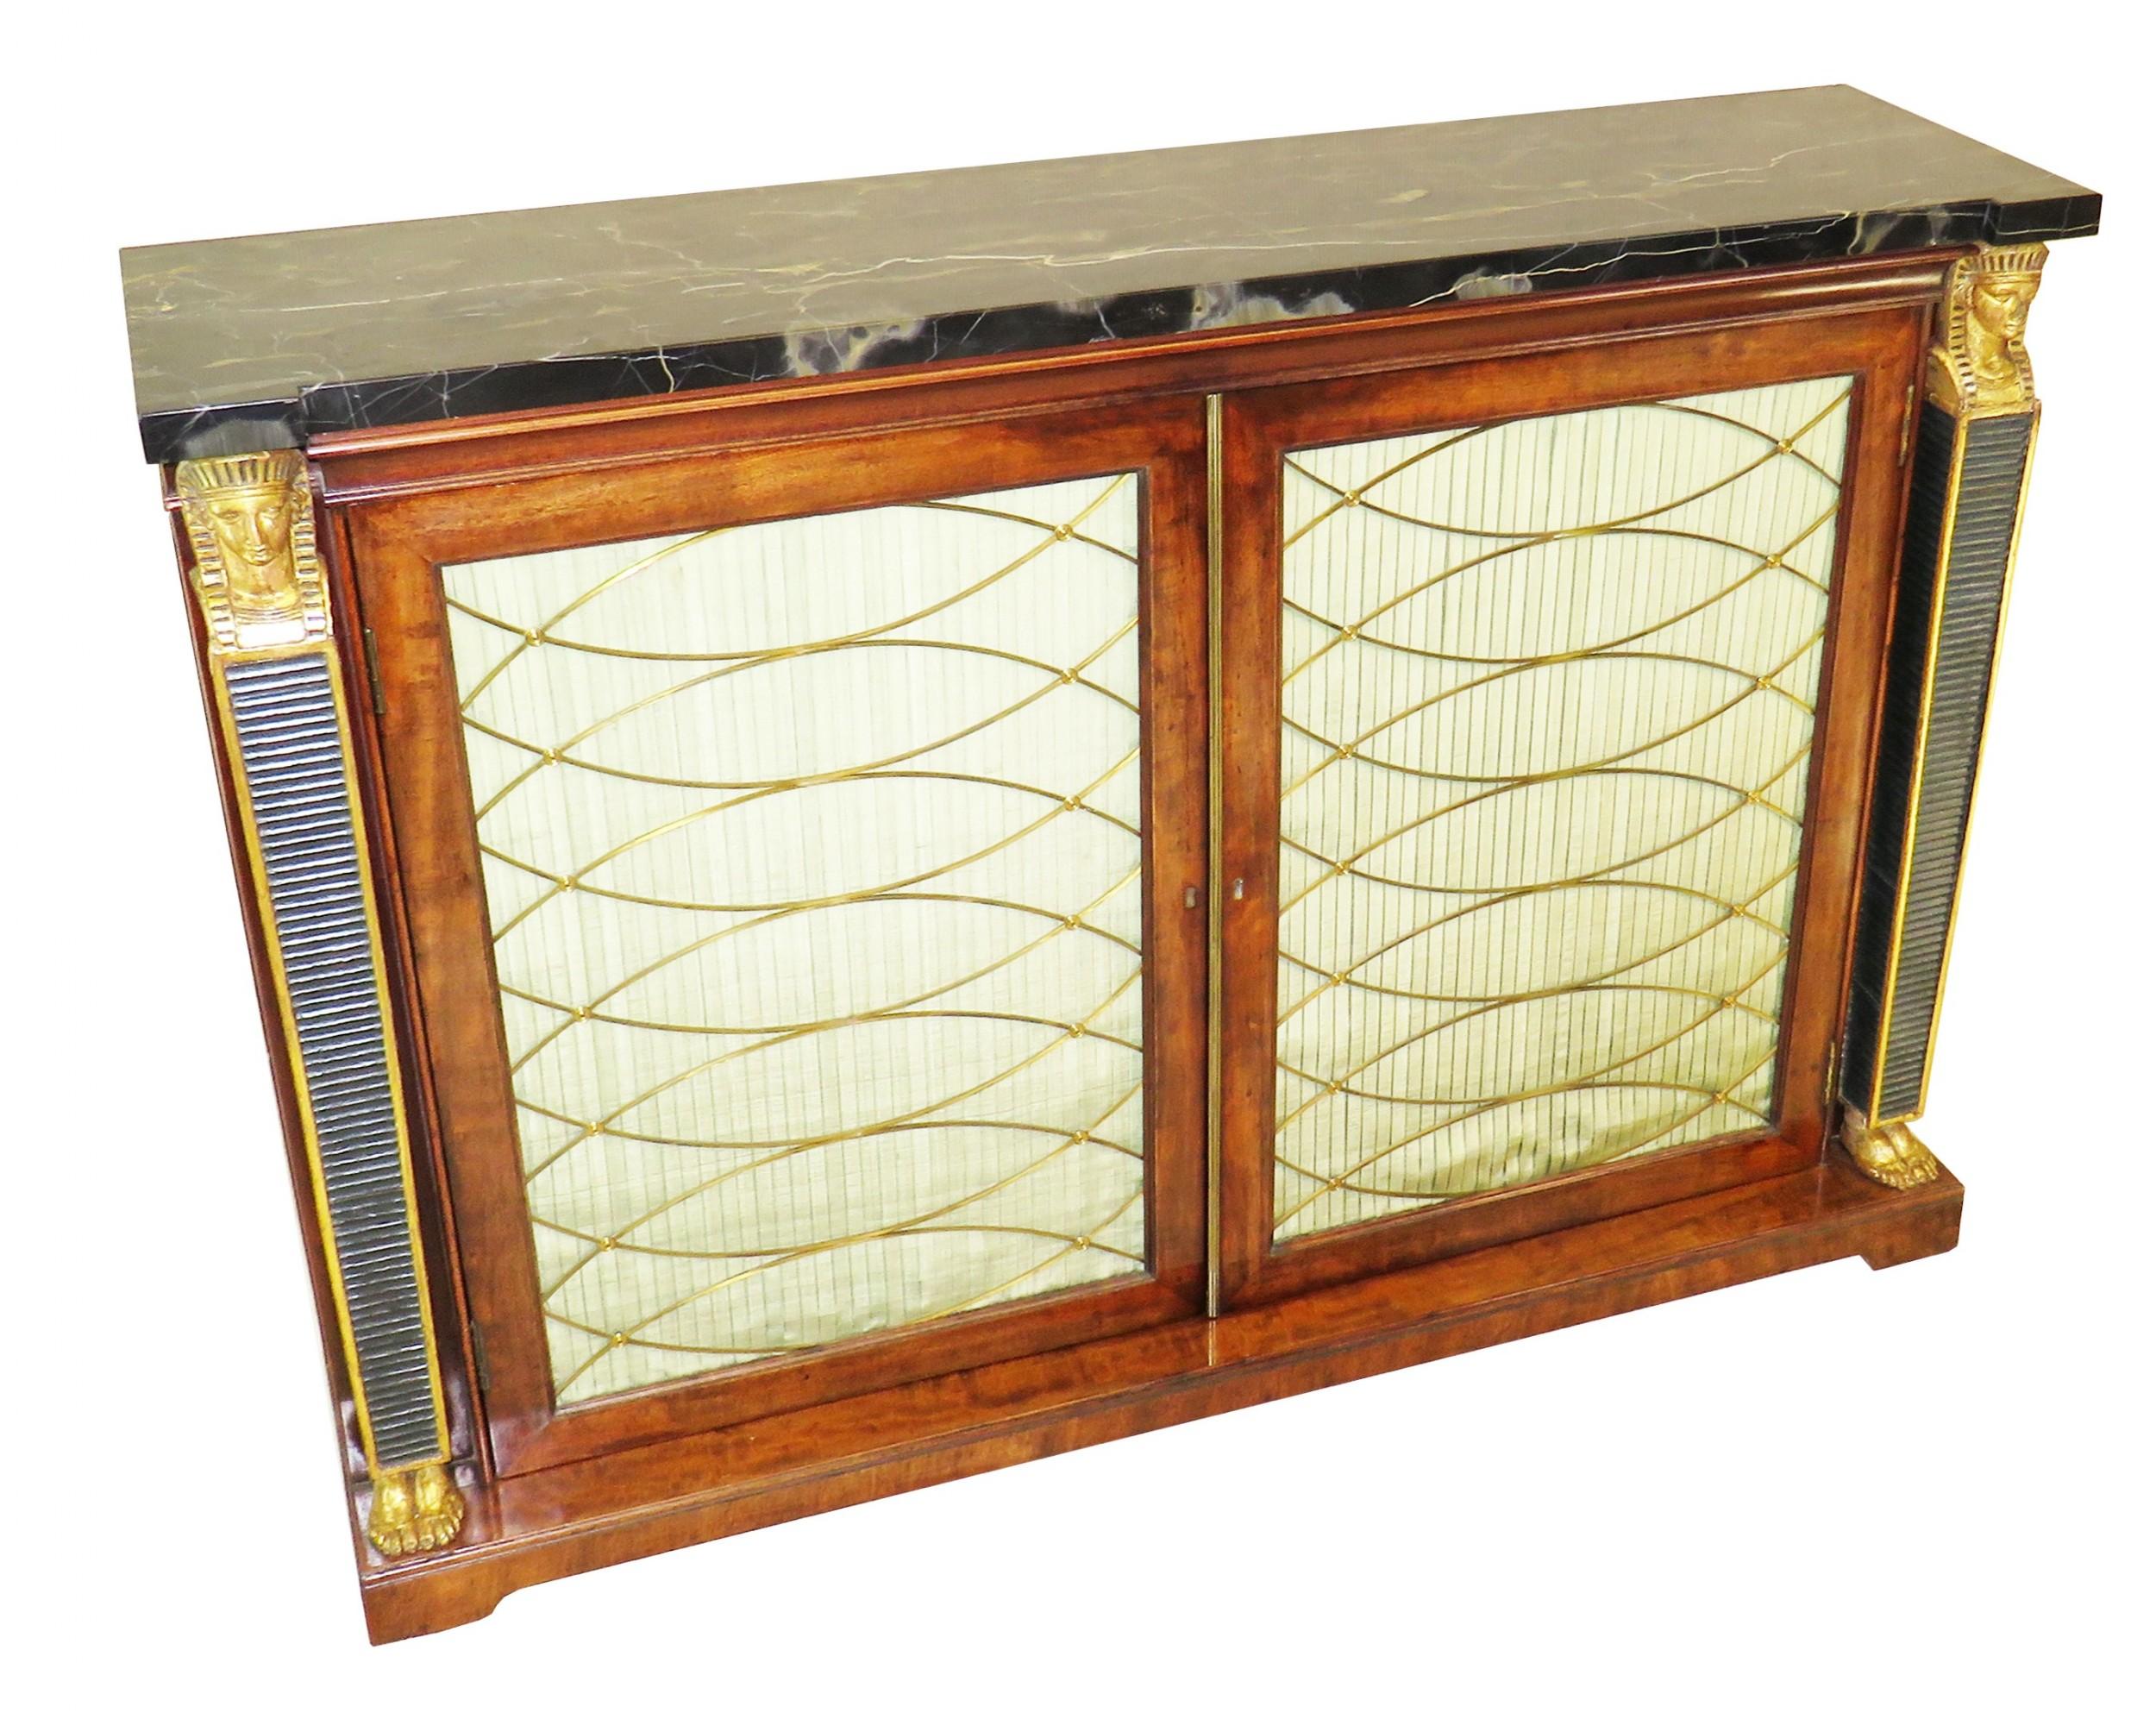 regency 19th century english mahogany parcel gilt side cabinet